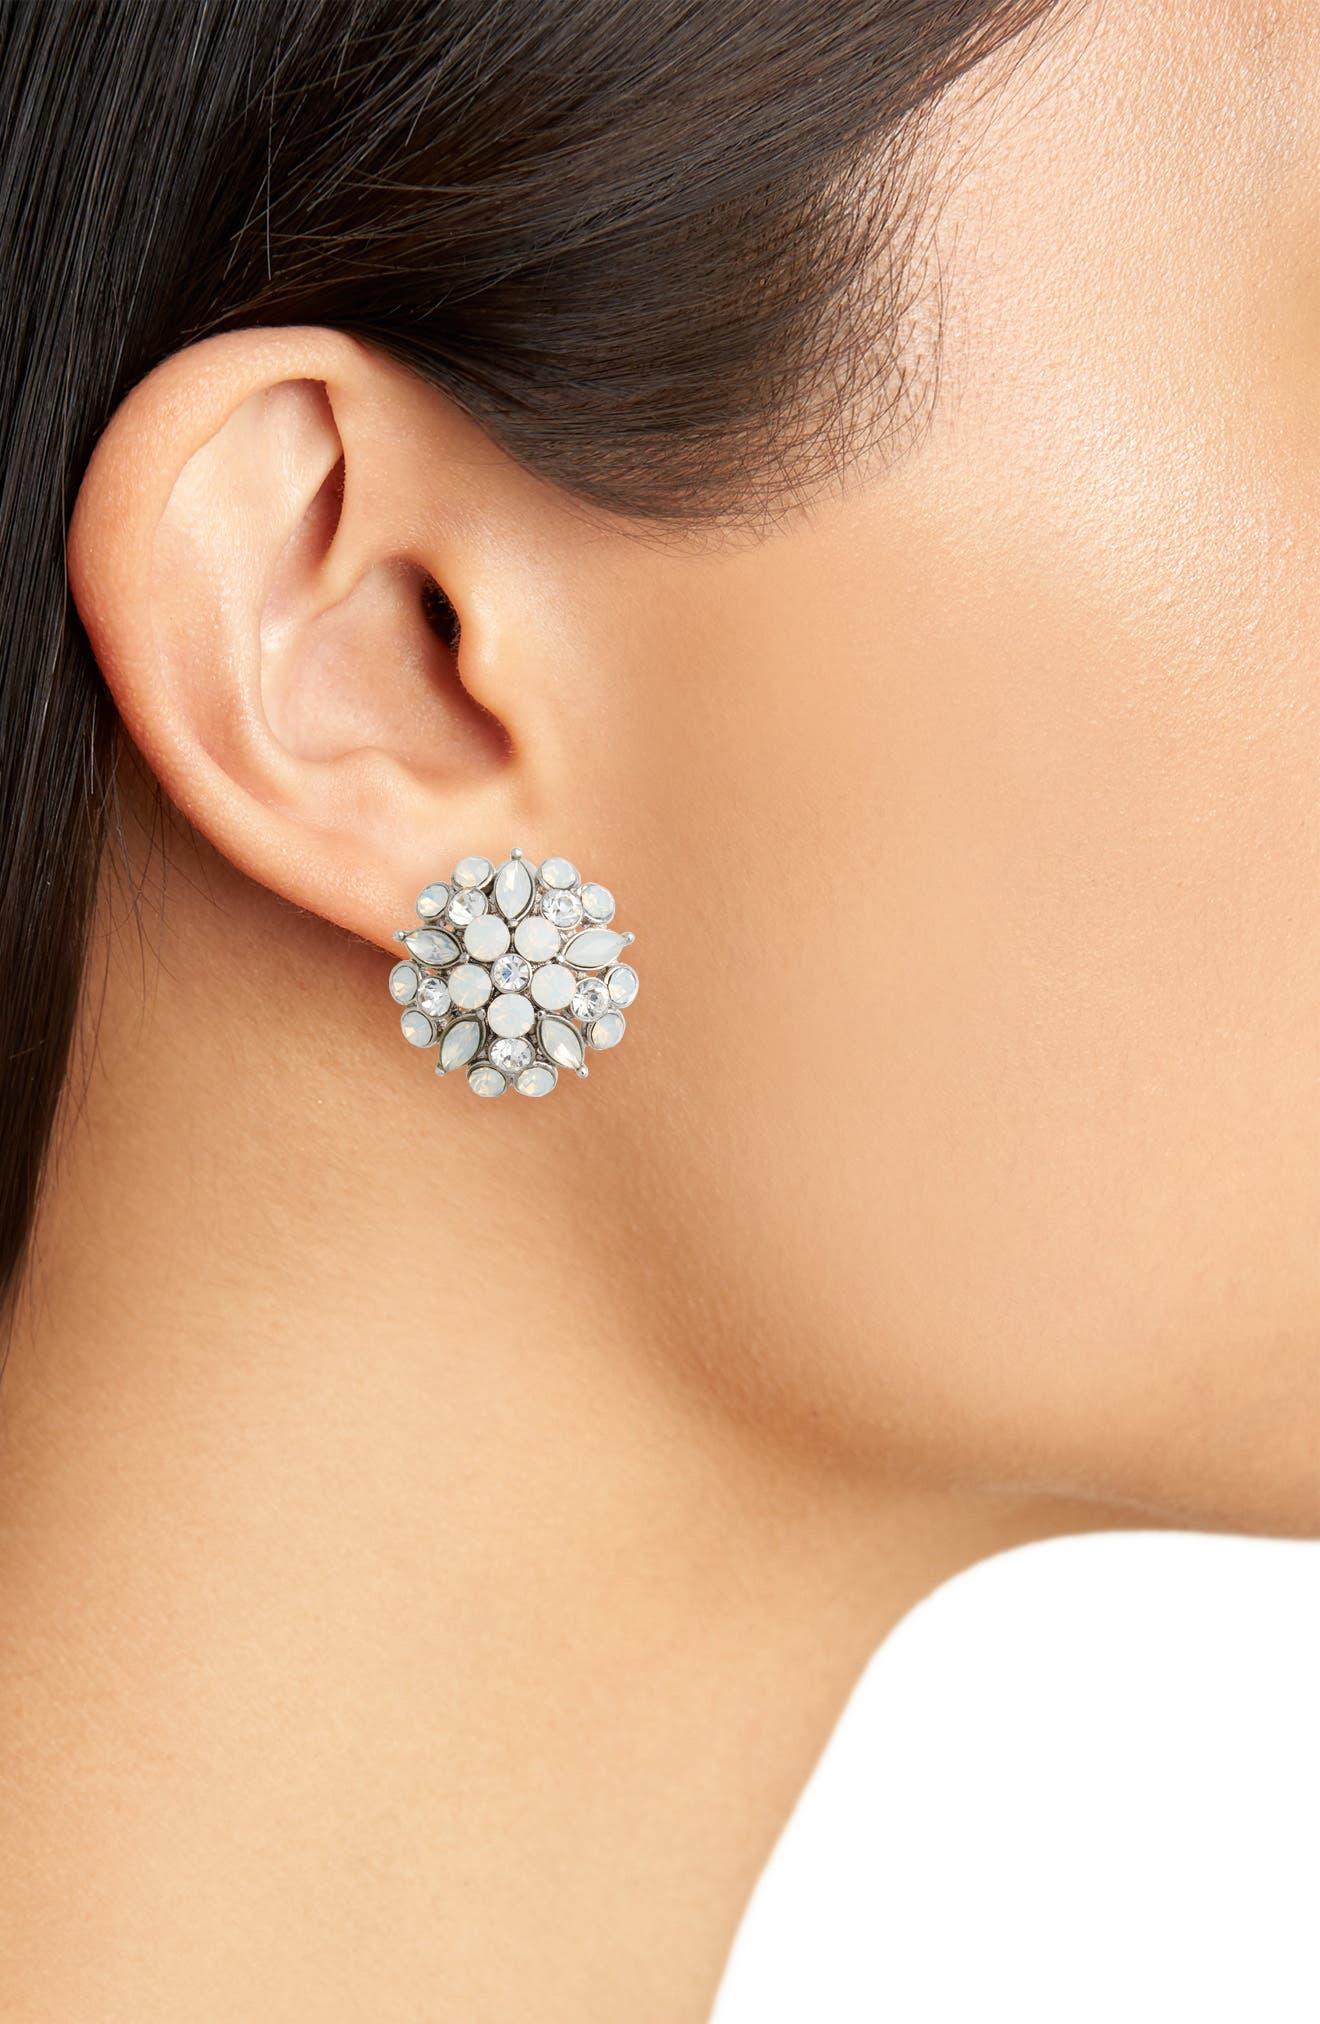 NINA, Floral Stud Earrings, Alternate thumbnail 2, color, SILVER/ OPAL/ WHITE CRYSTAL